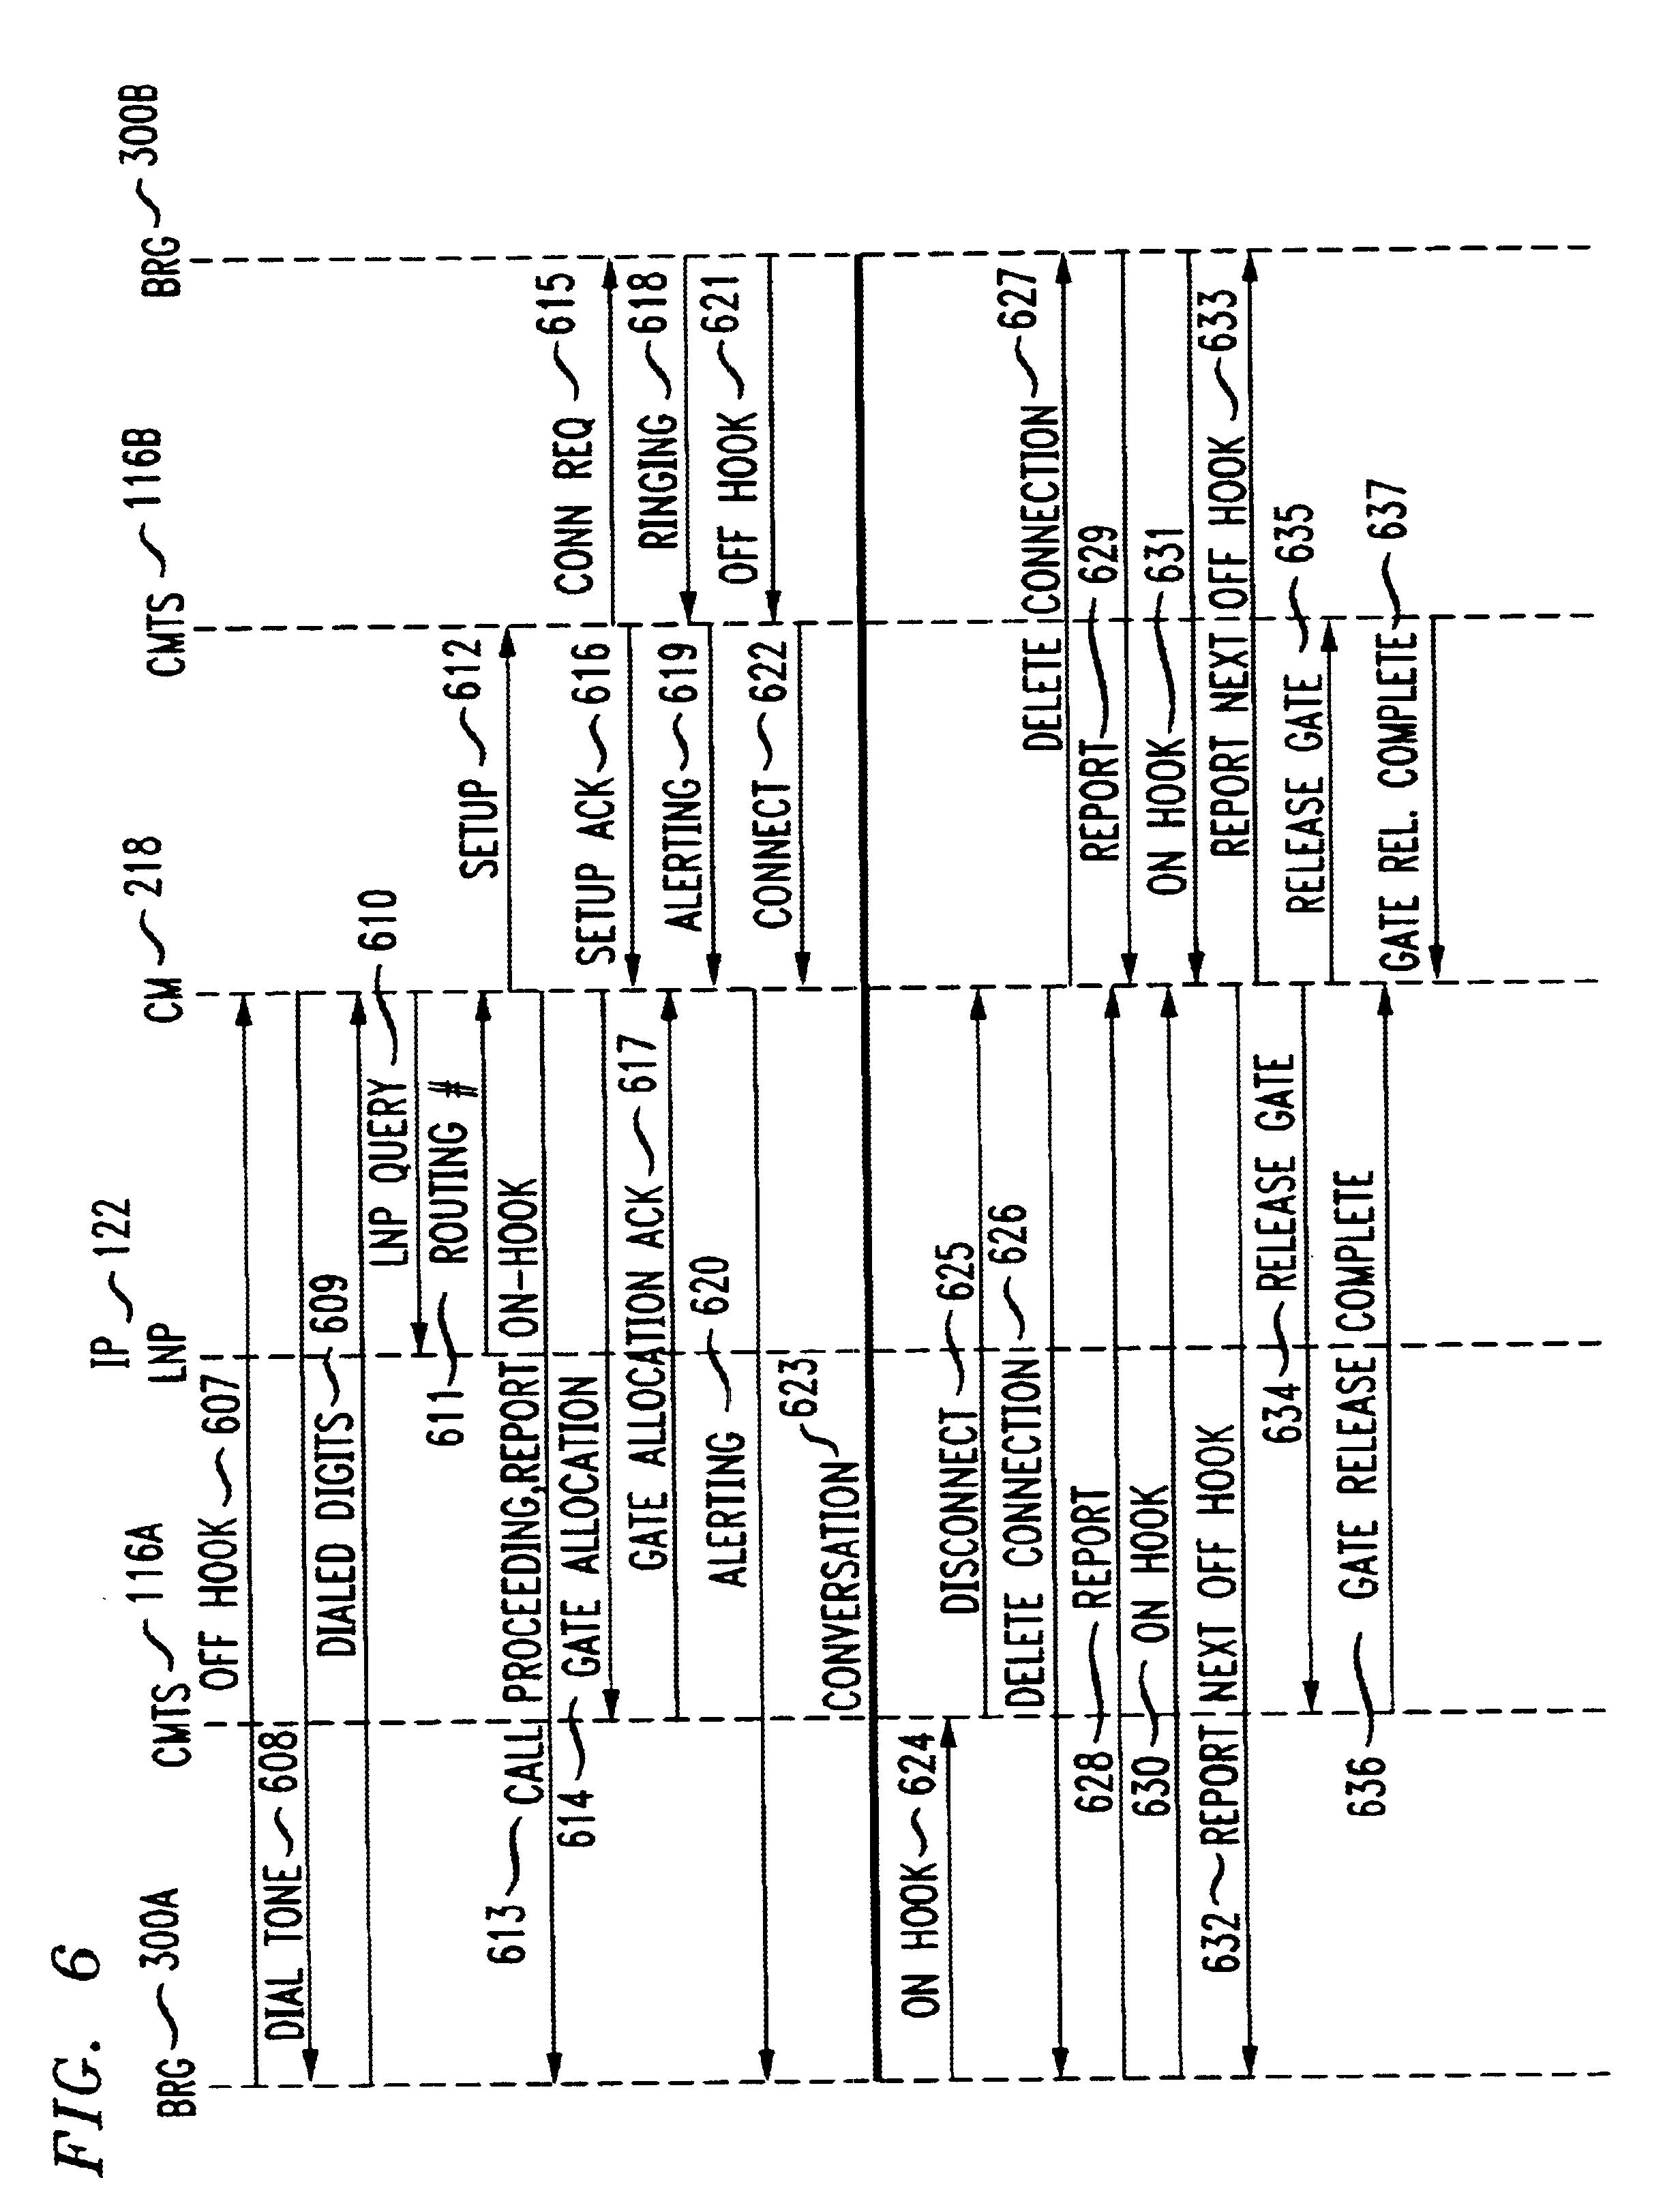 Patent US 6,671,262 B1